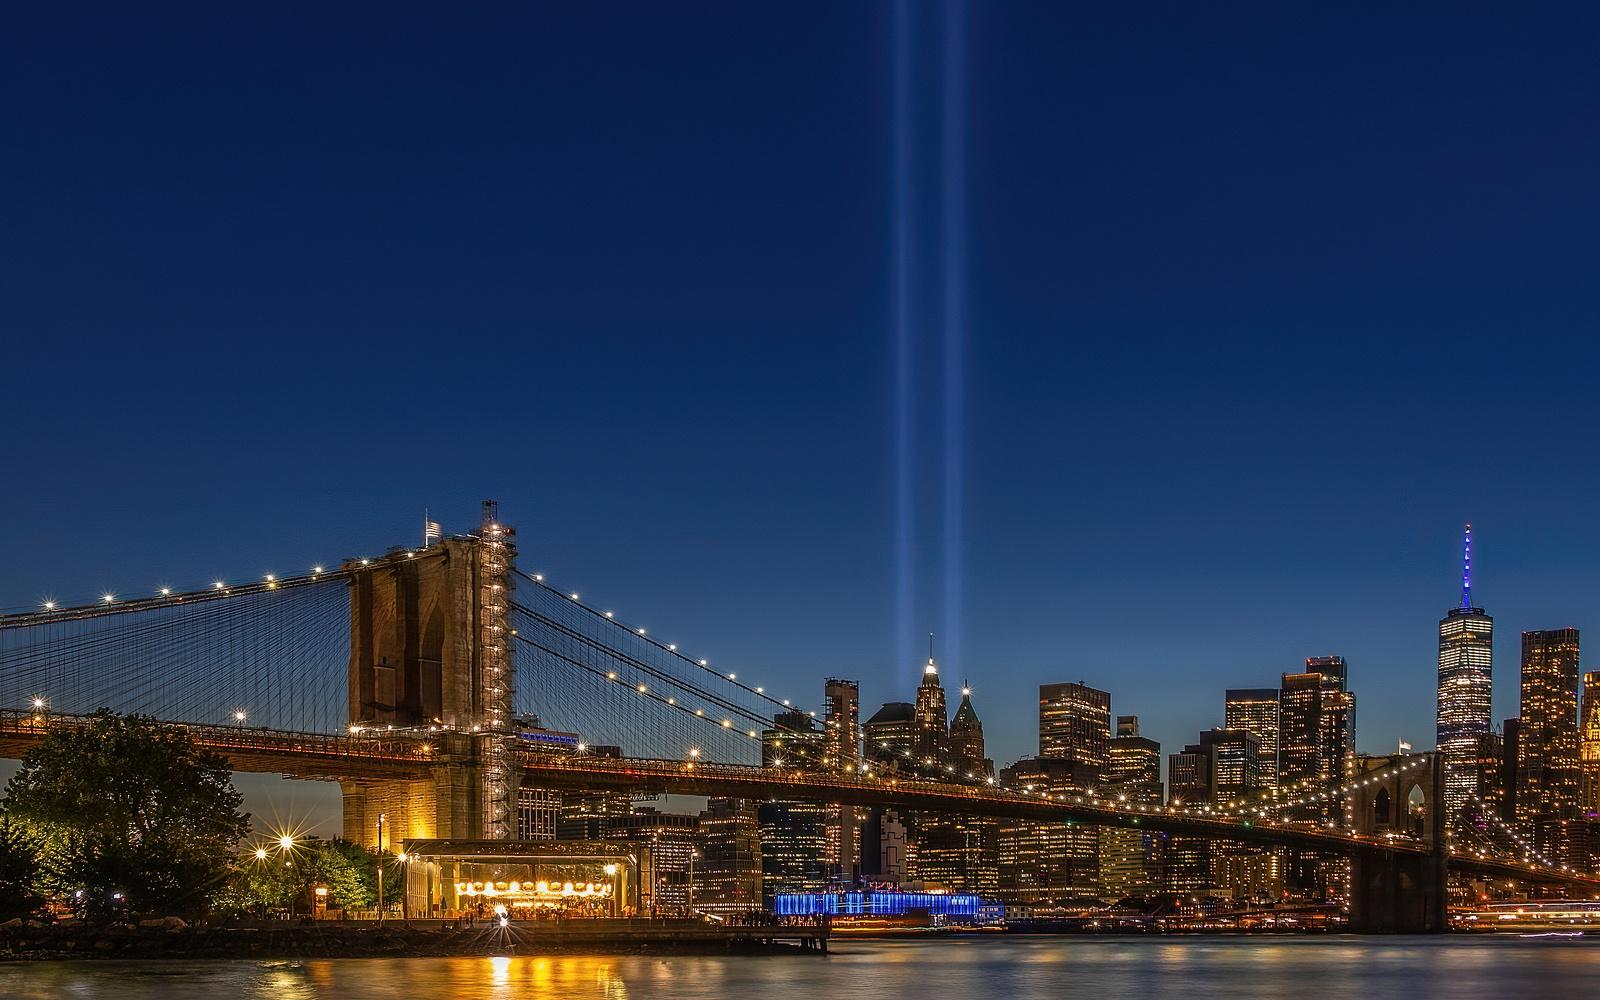 NYC 9-11 Photo Shoot